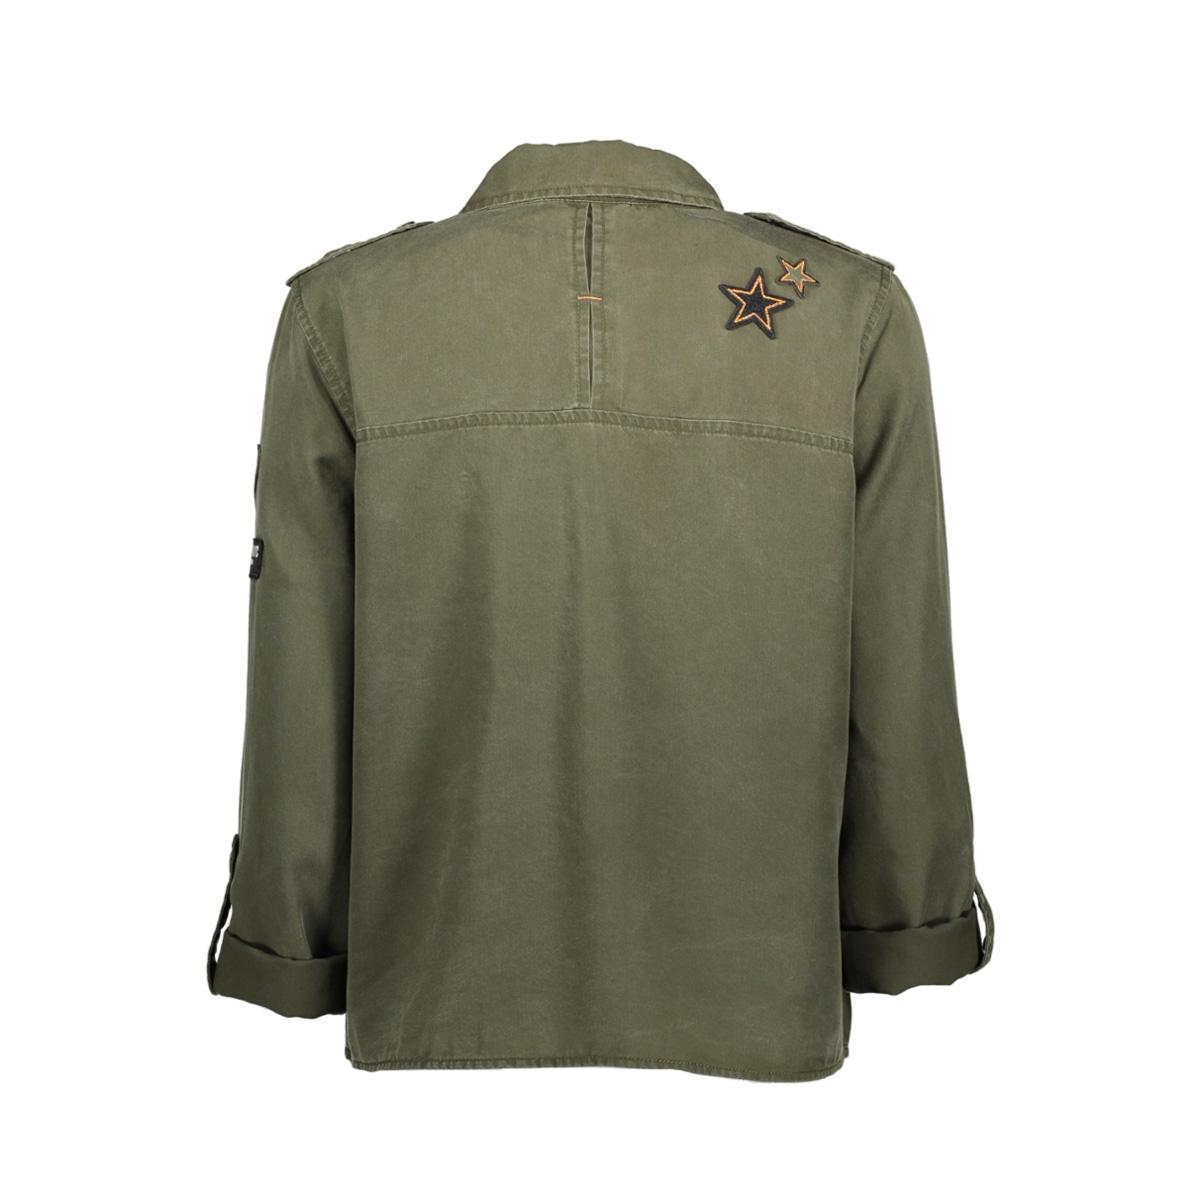 2055058.00.71 tom tailor blouse 7817